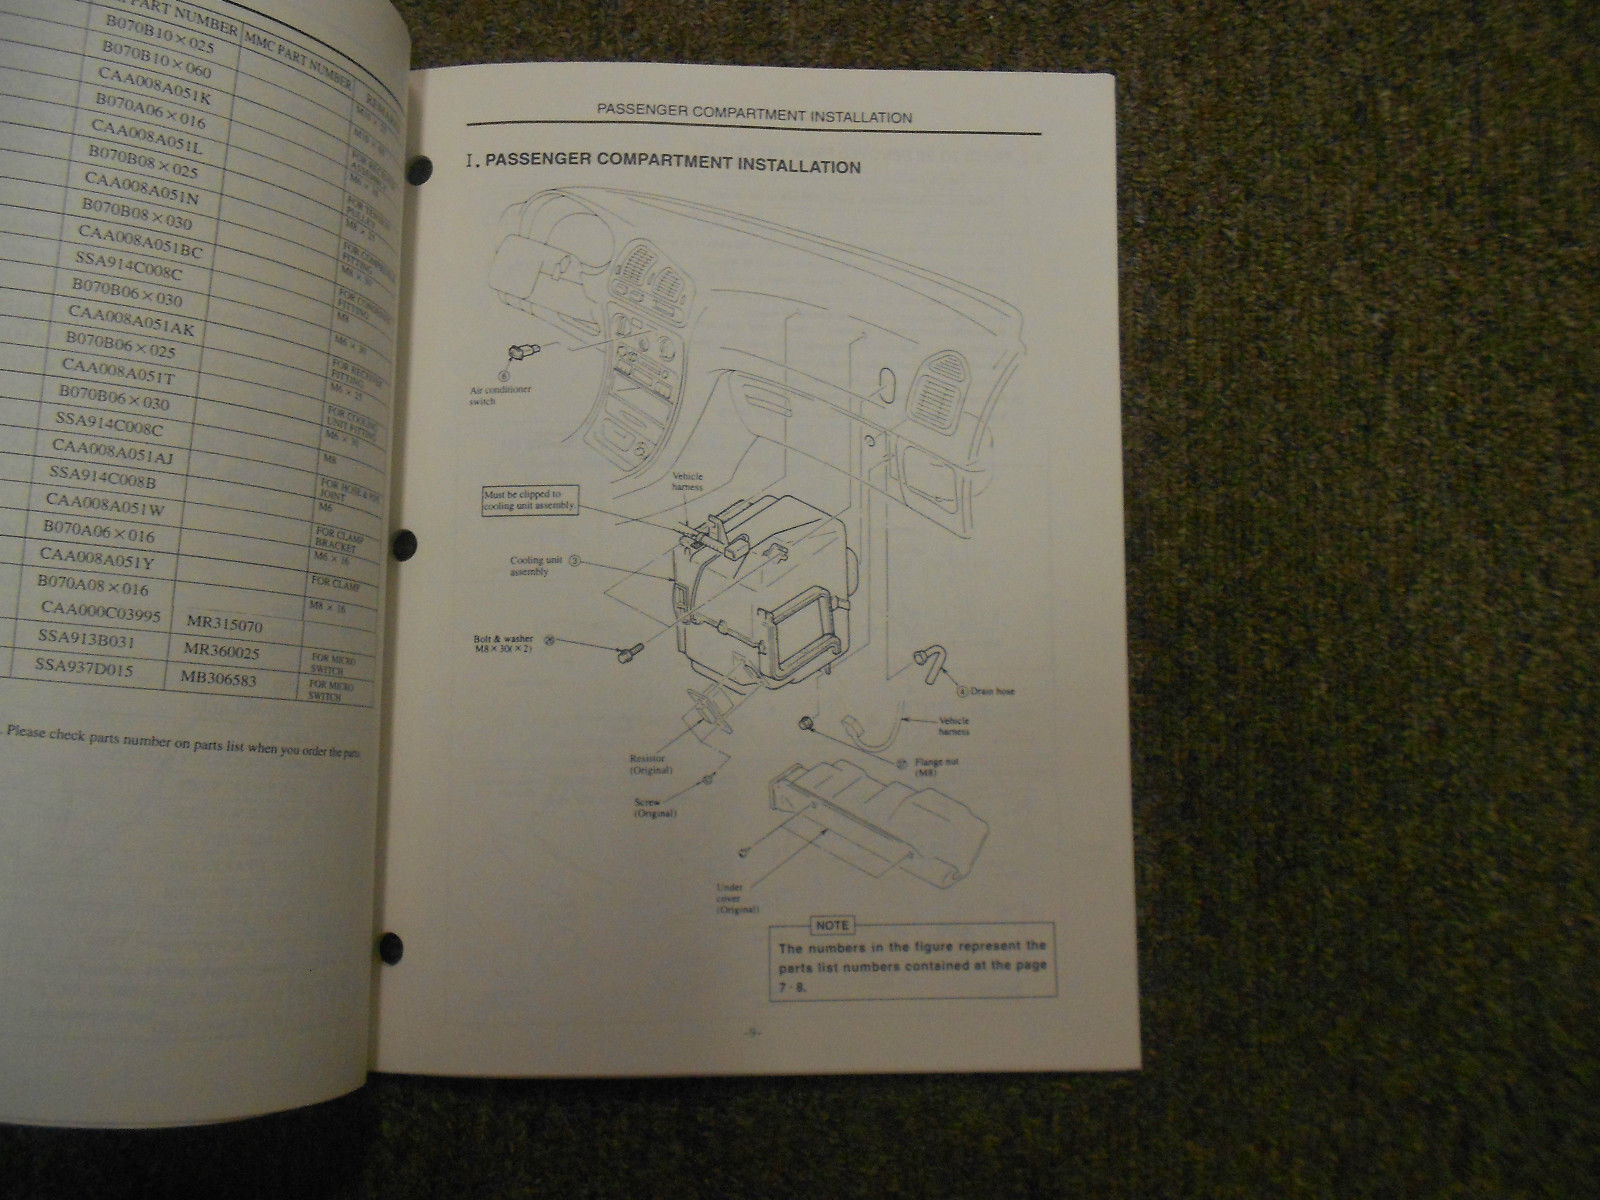 1997 MITSUBISHI Galant Air Conditioning Installation Instructions Service Manual